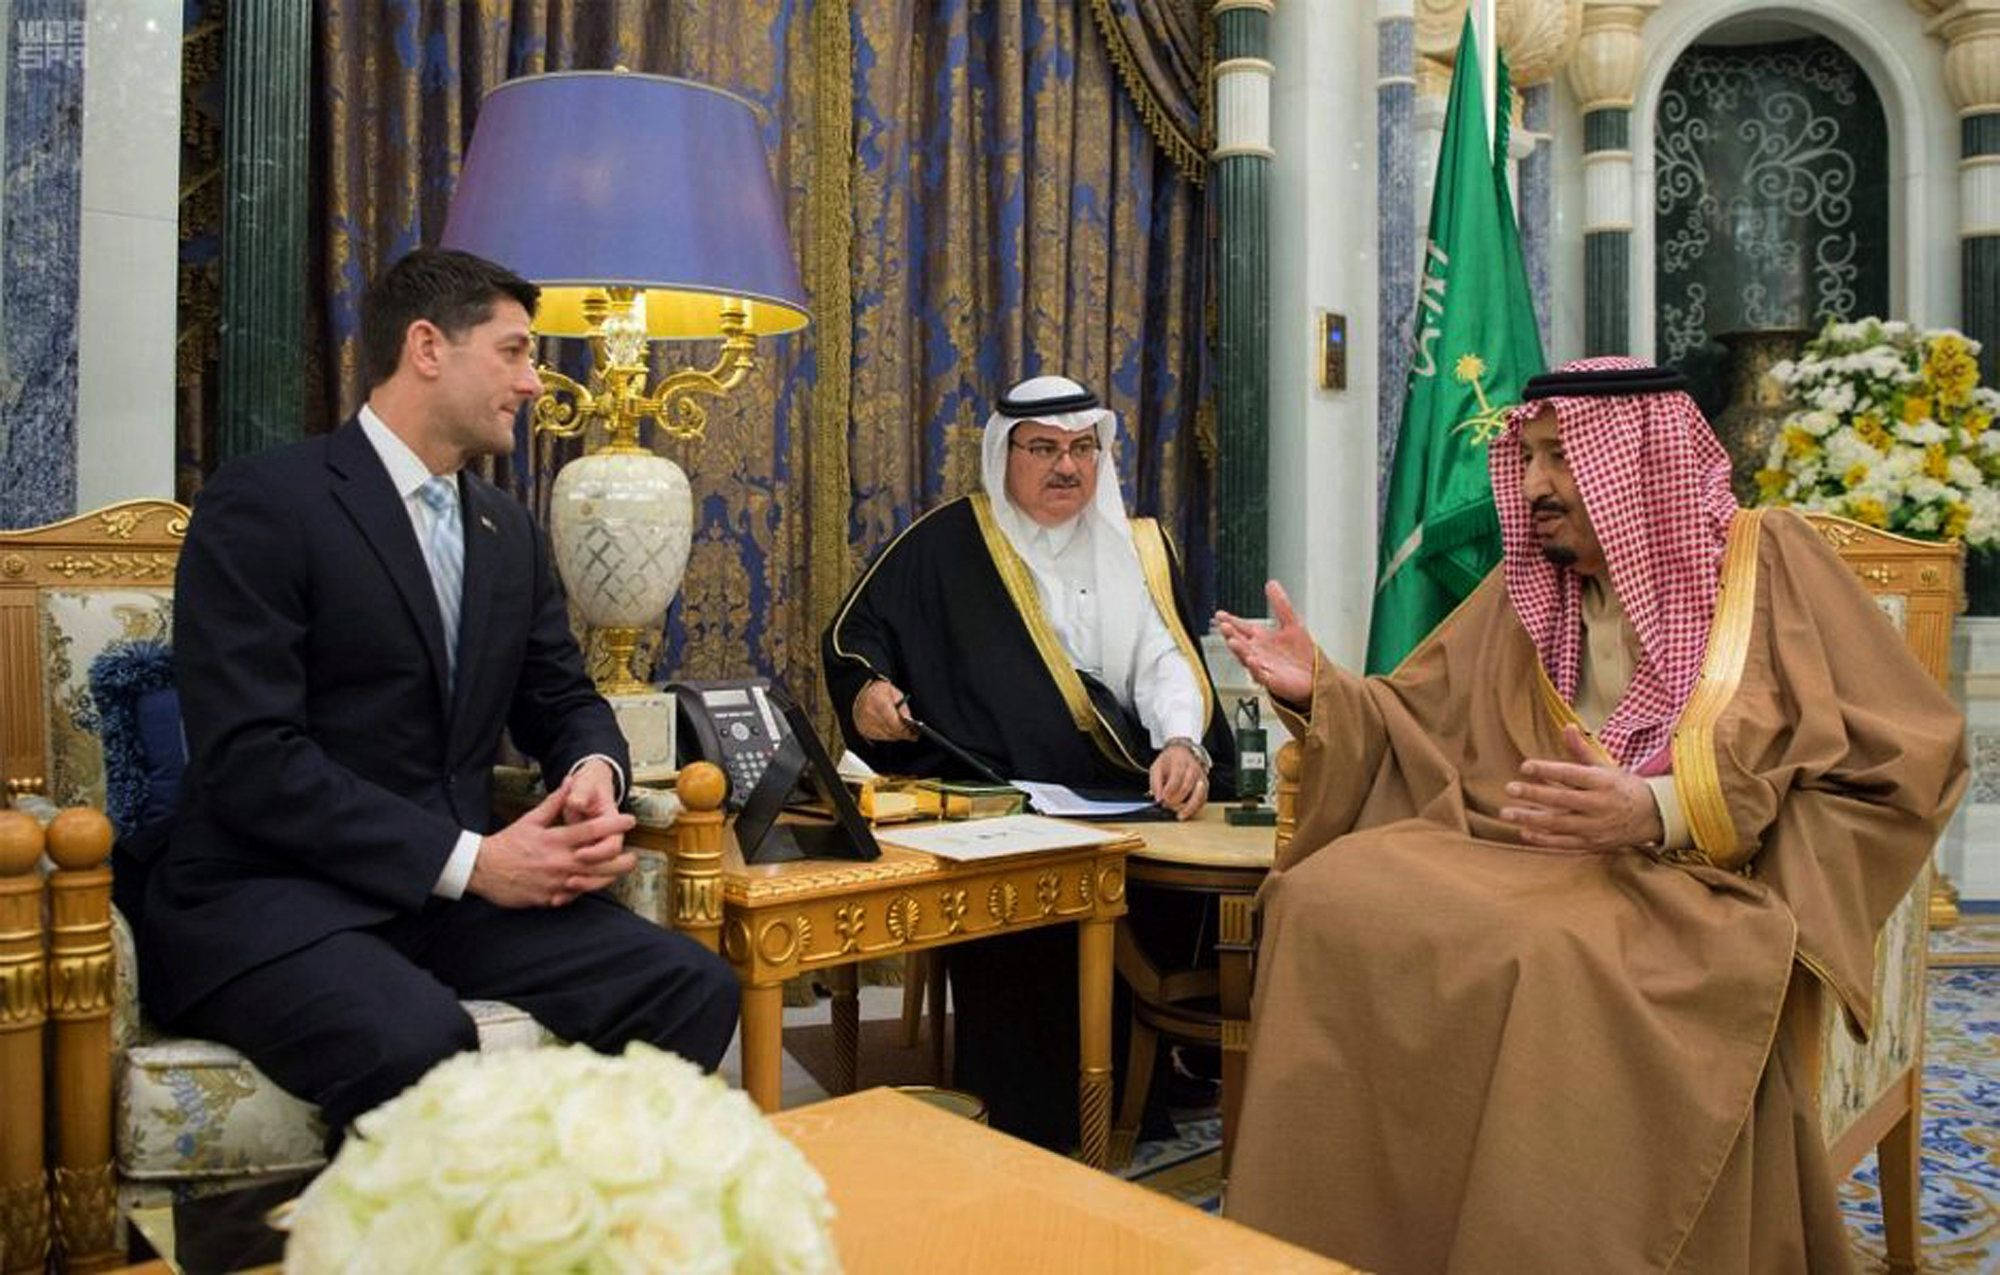 Speaker Paul Ryan made a big goodwill gesture to Saudi Arabia and its King Salman.